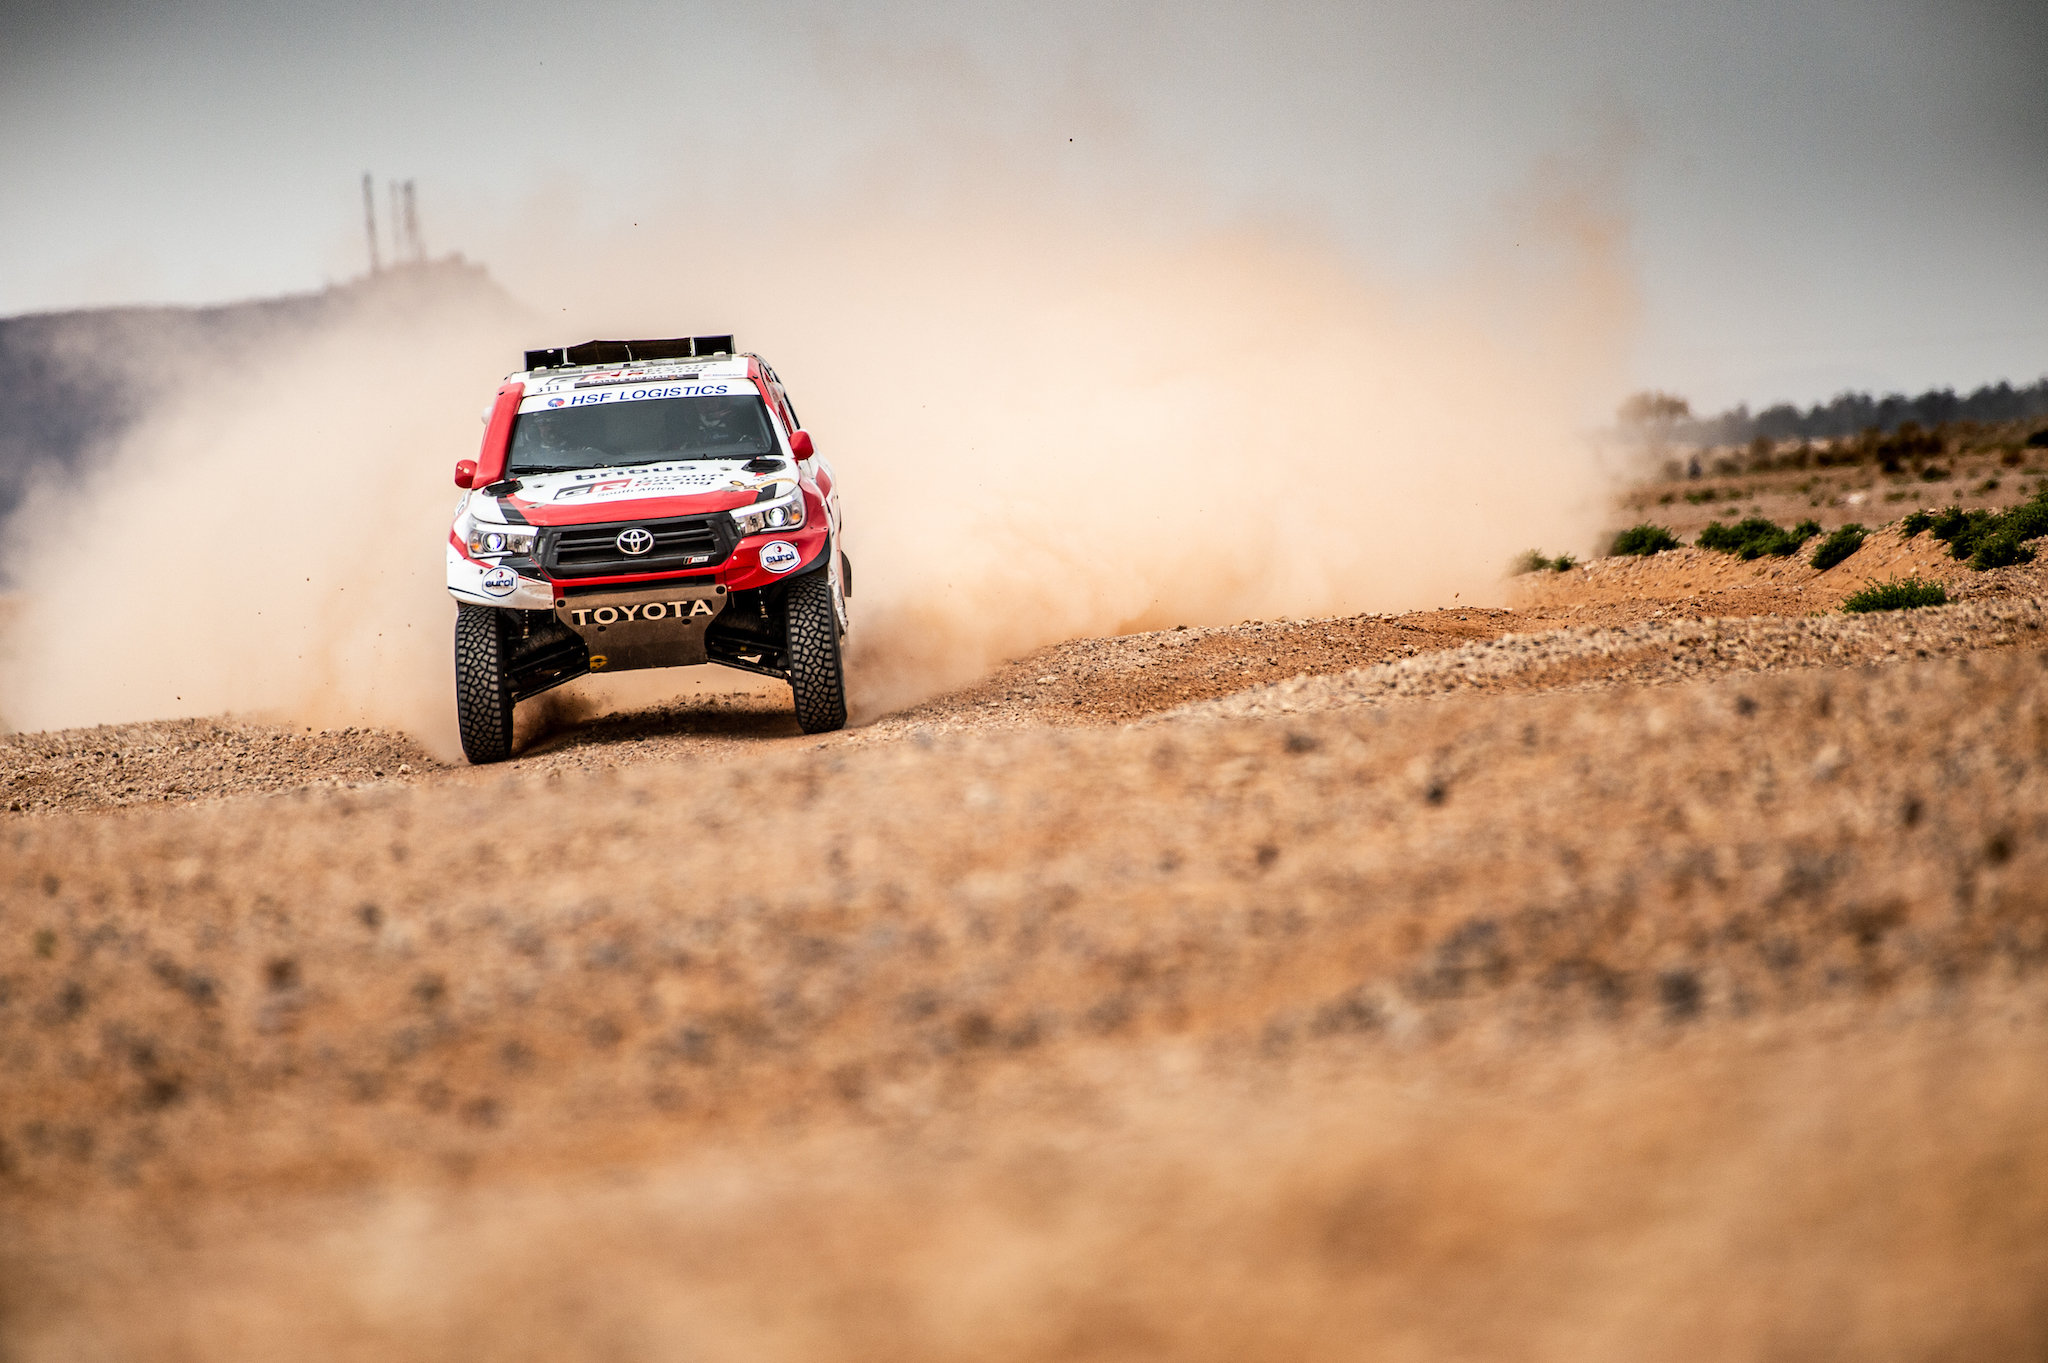 Bernhard ten Brinke besluit Rallye du Maroc met podiumfinish